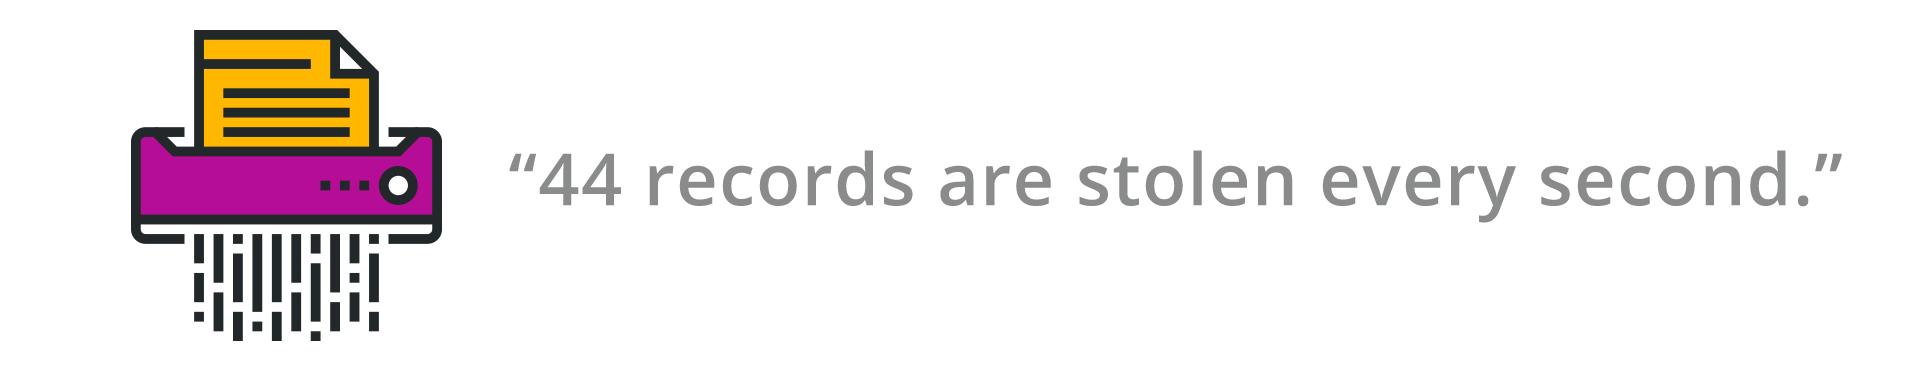 stolen records stat